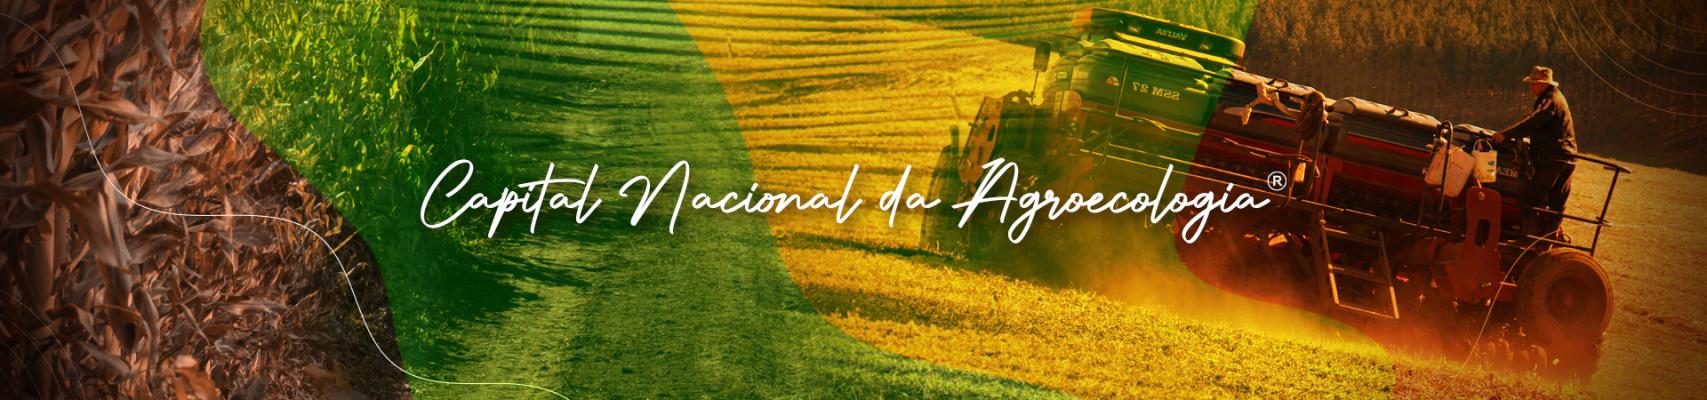 Banner 2 - Capital Nacional da Agroecologia